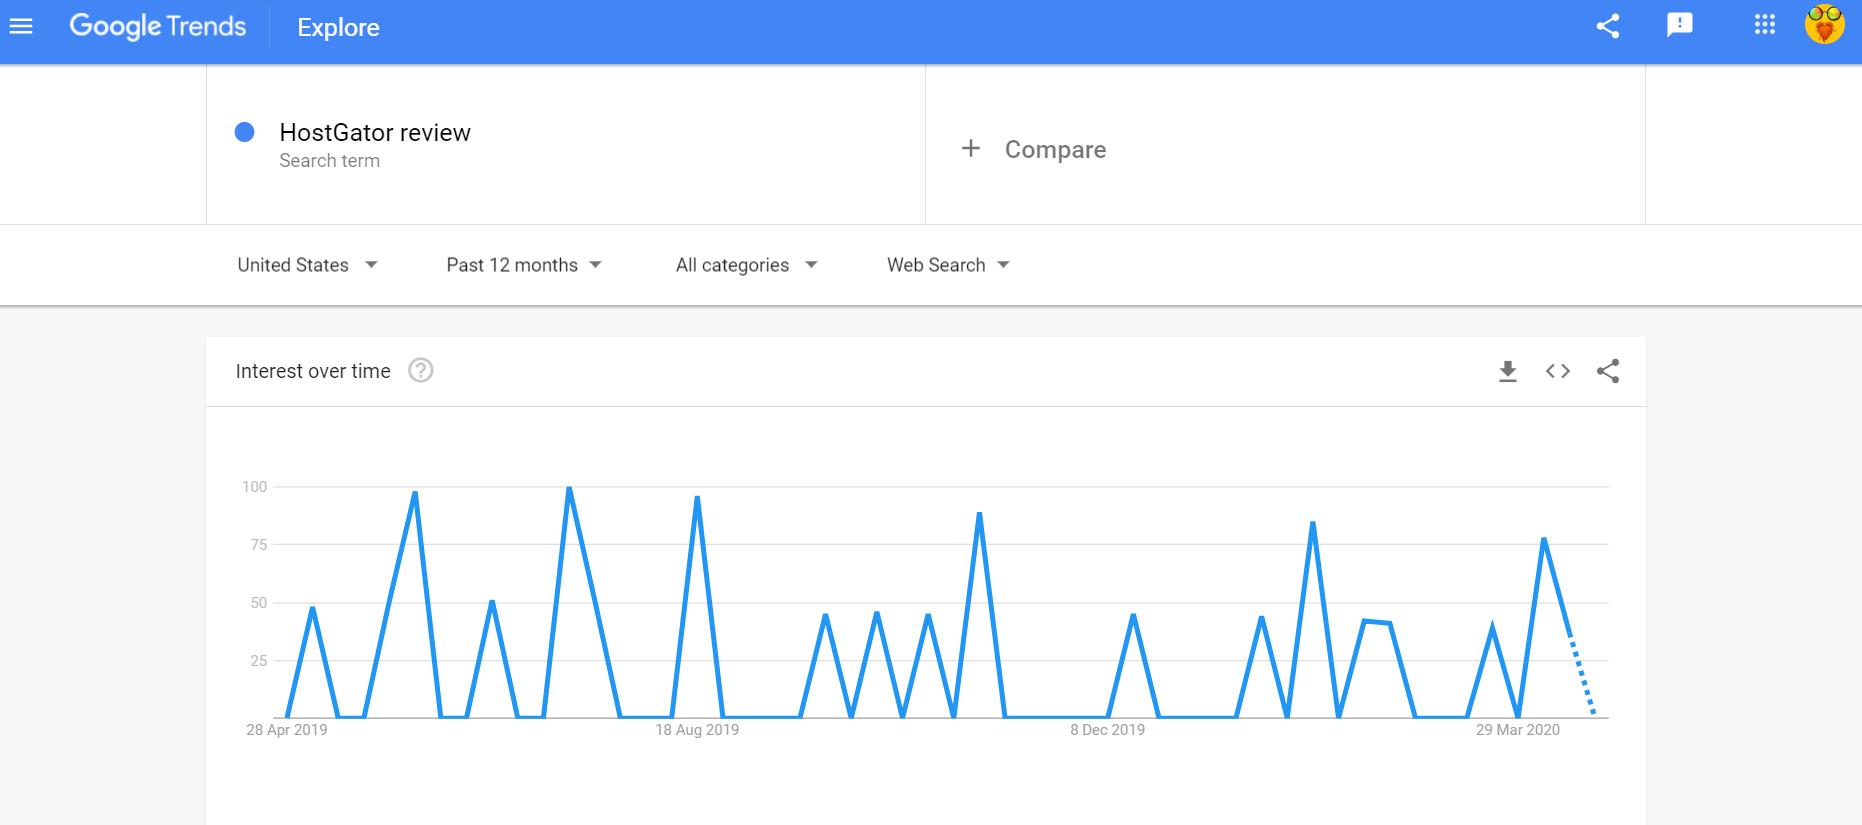 HostGator Review Google Trends